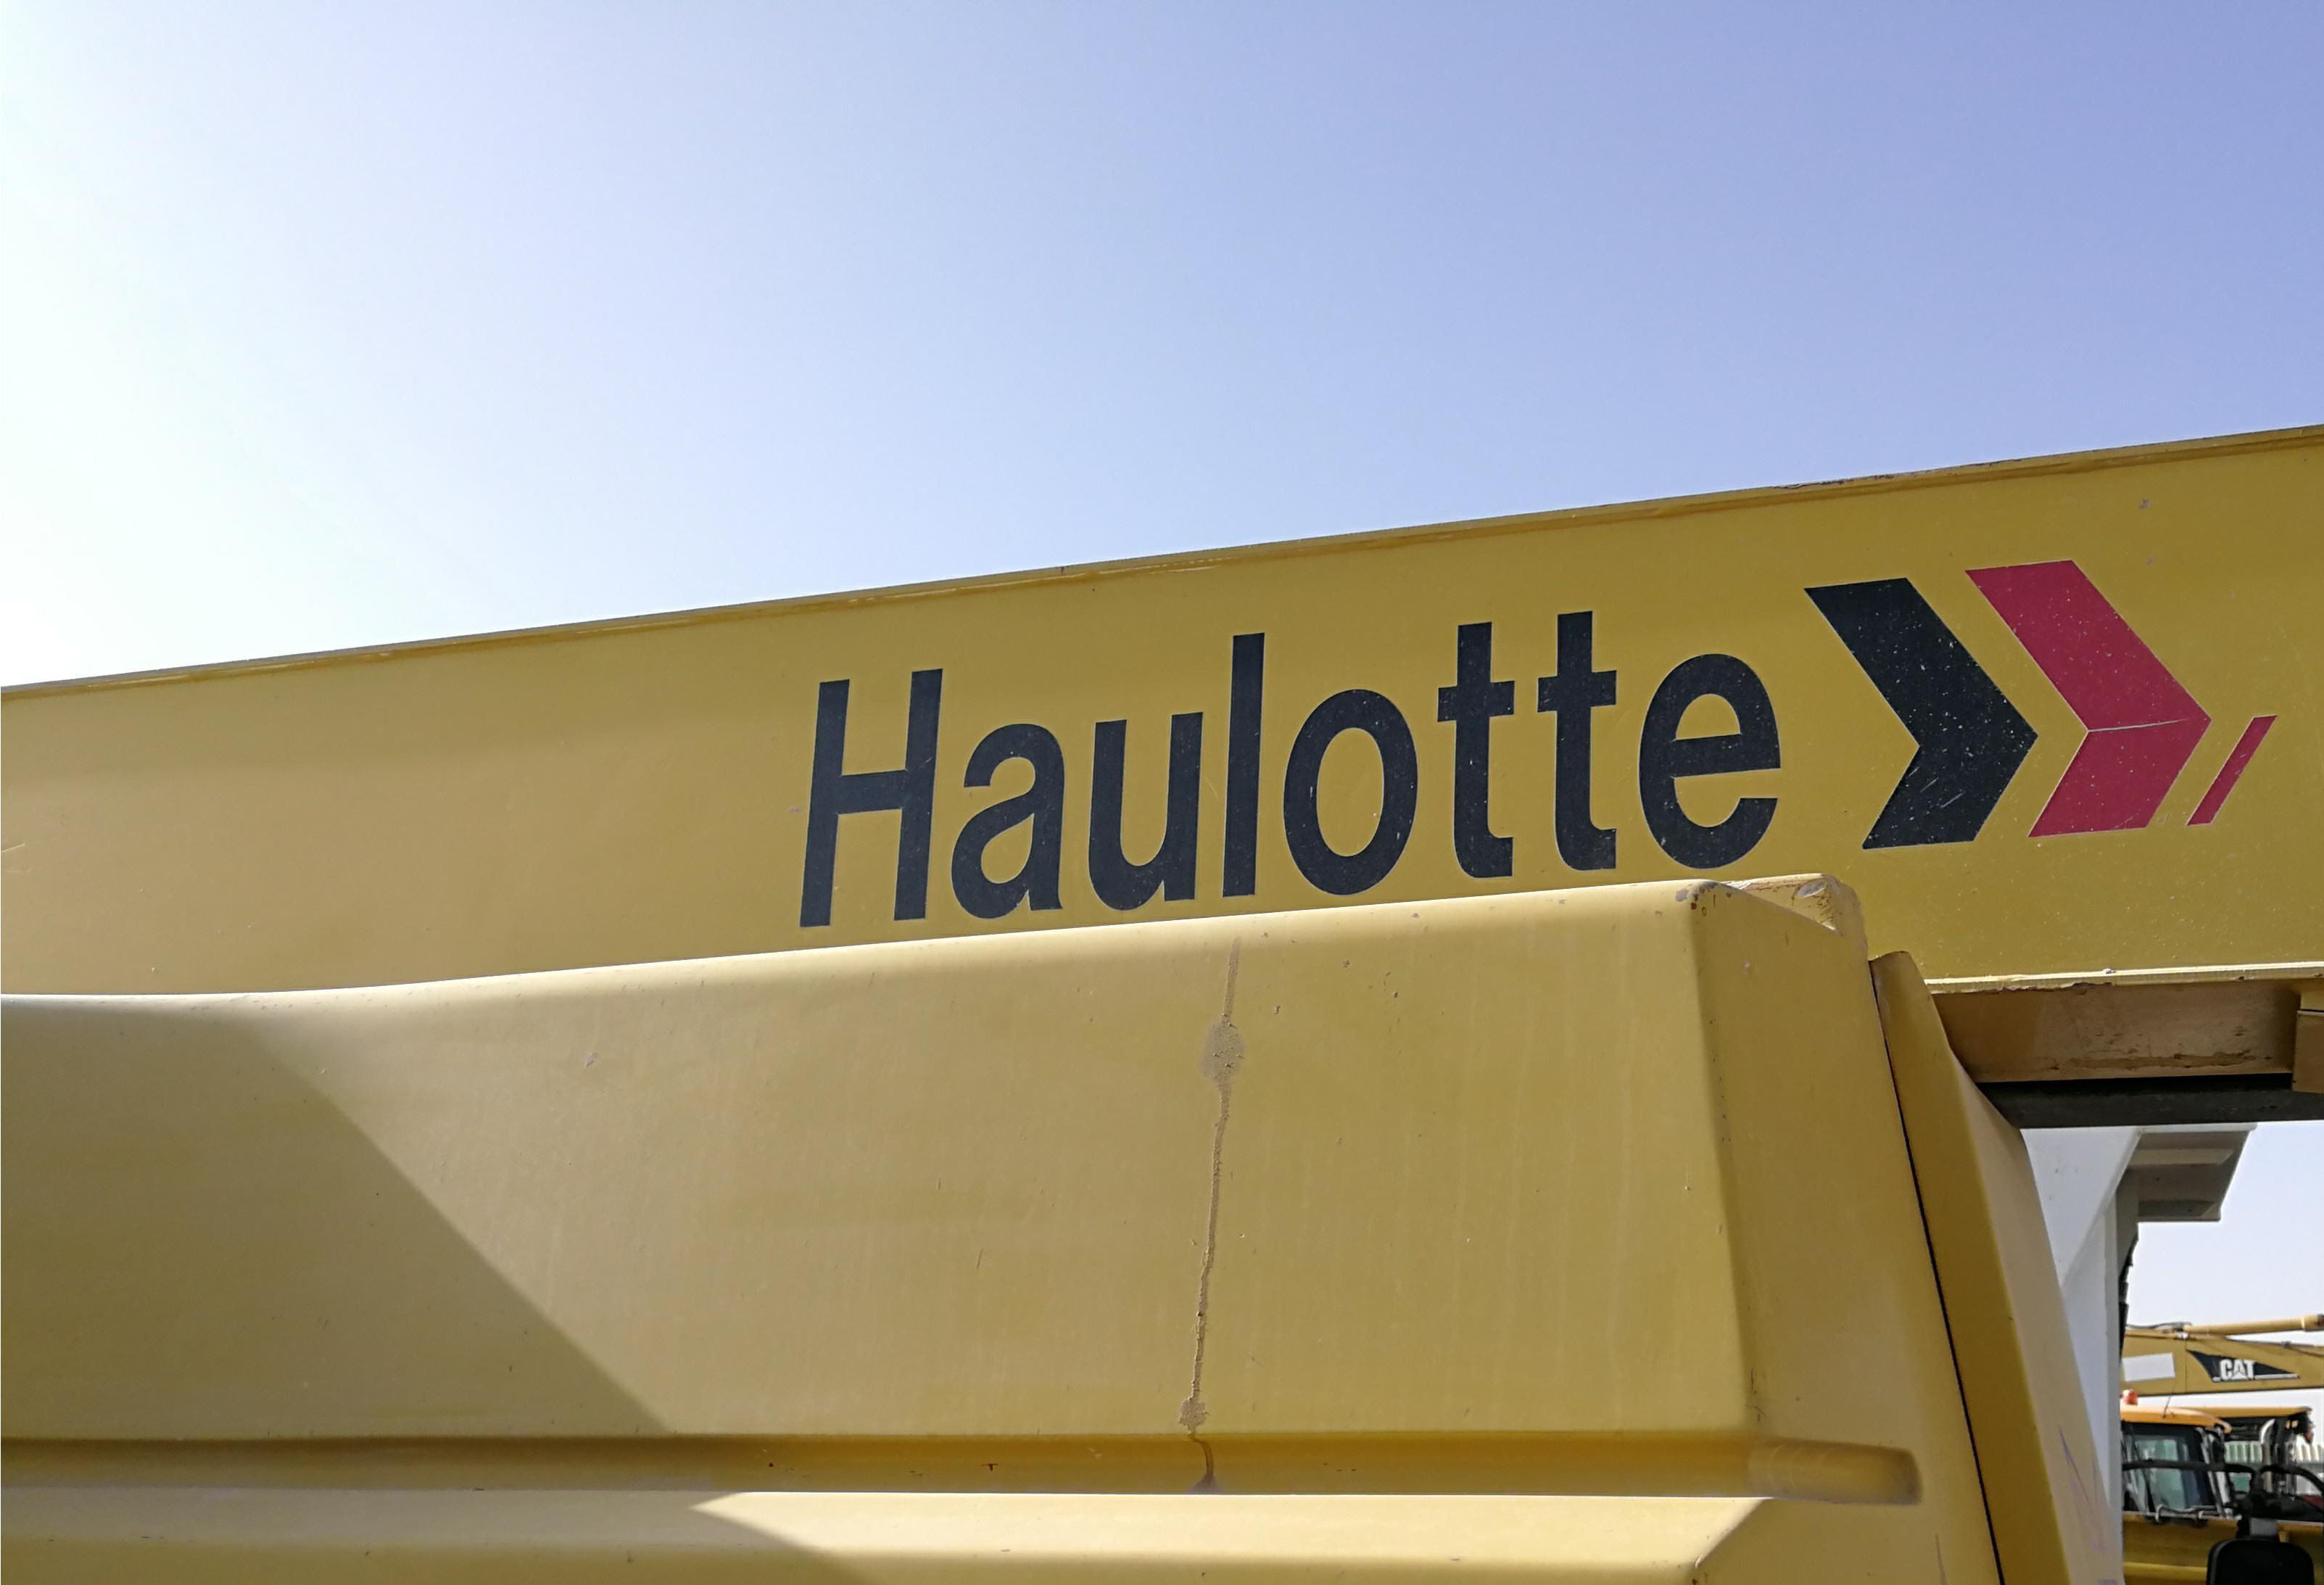 Haulotte 32 PX